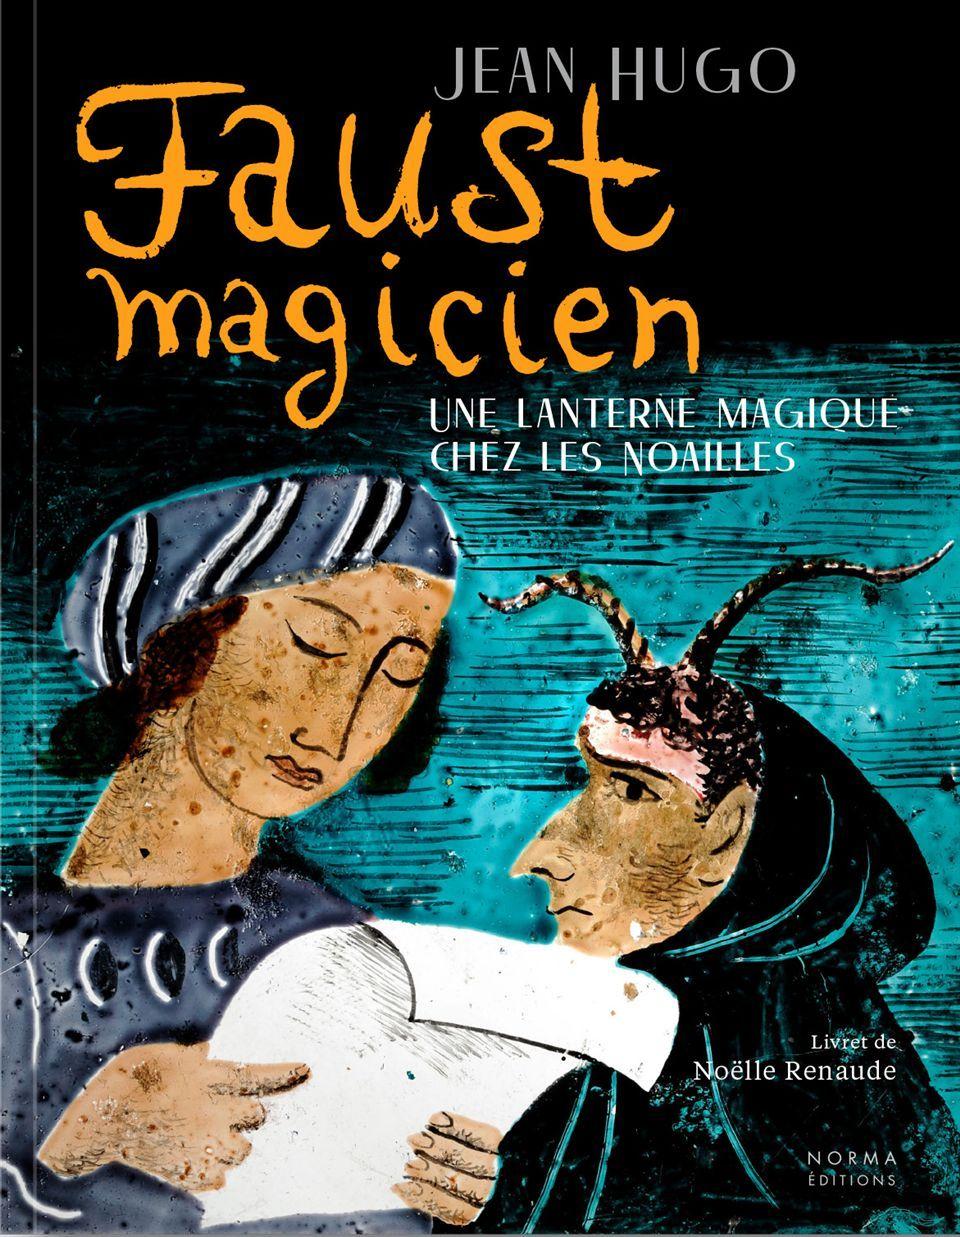 FAUST MAGICIEN - JEAN HUGO